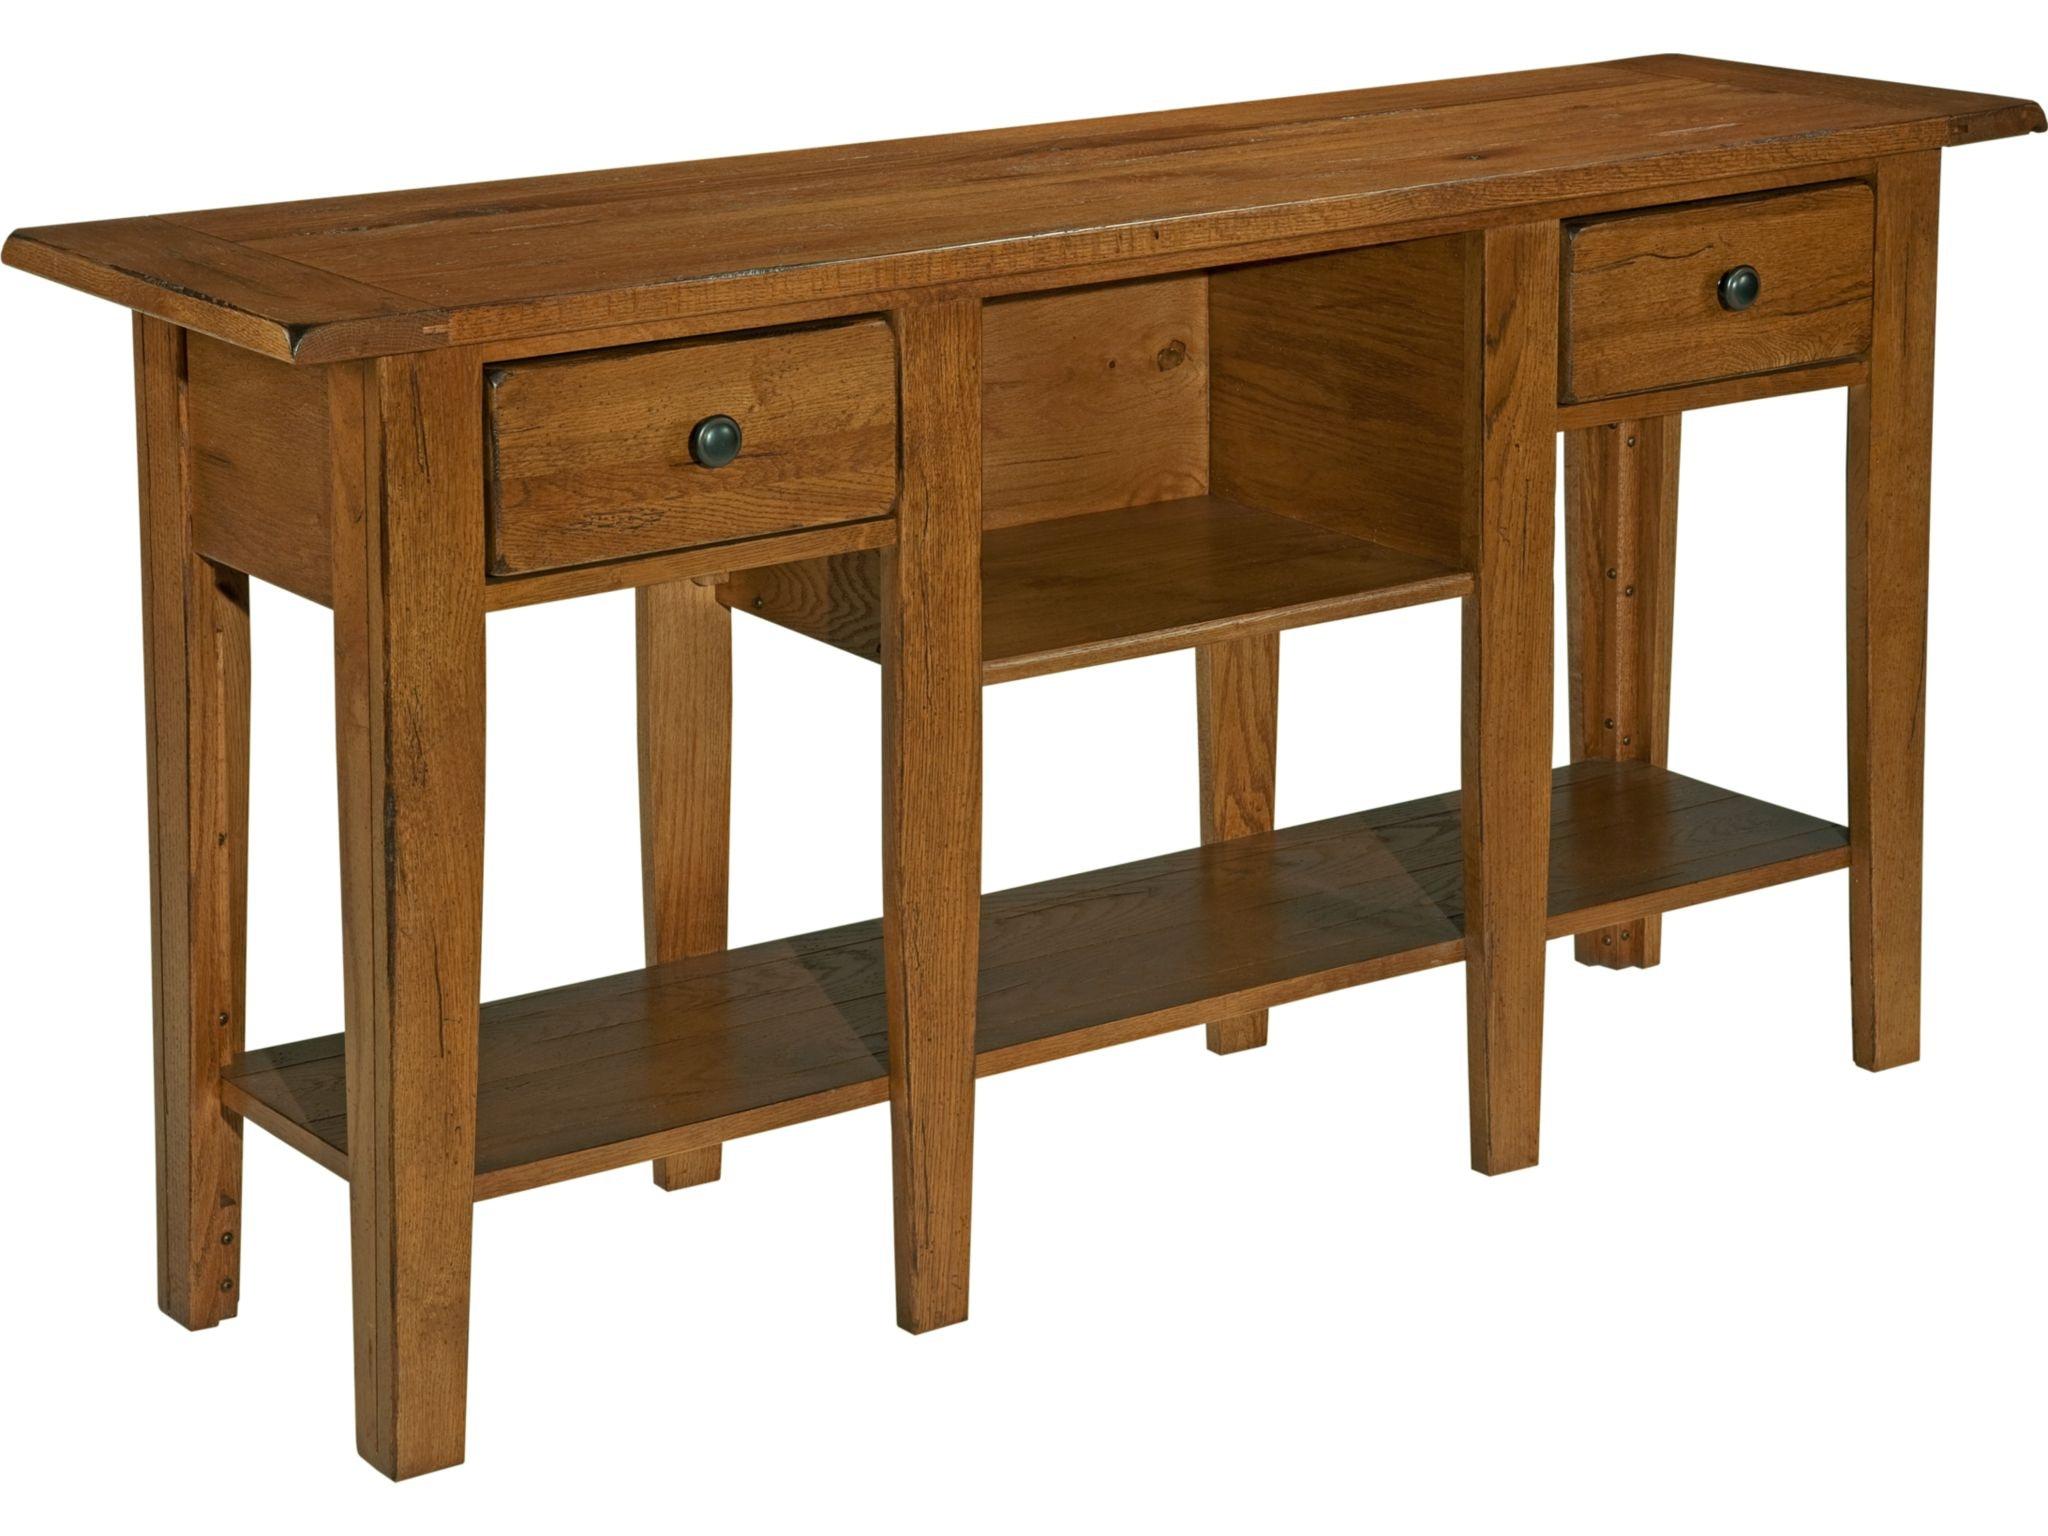 Broyhill Living Room Attic Heirlooms Sofa Table 3397 Sofa